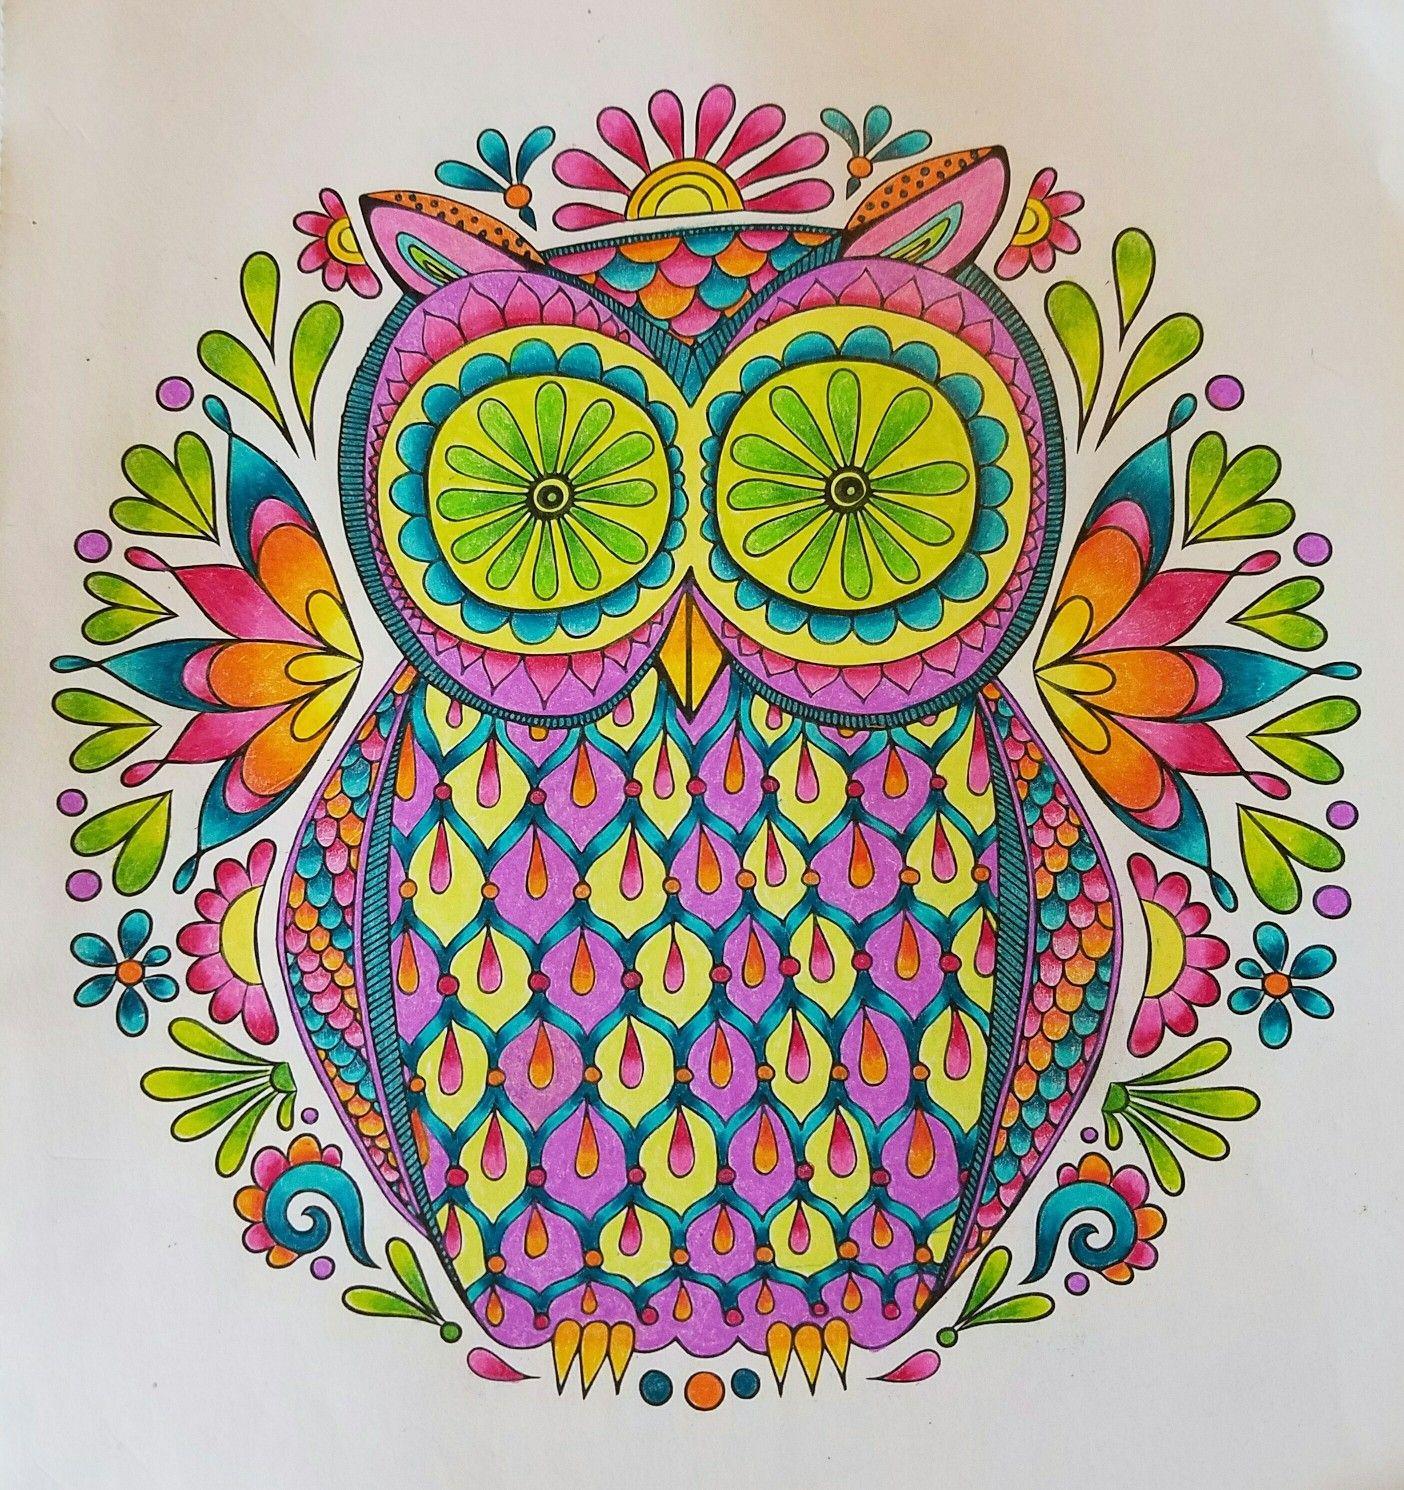 Owl Mandala From Nature Mandalas By Thaneeya McArdle